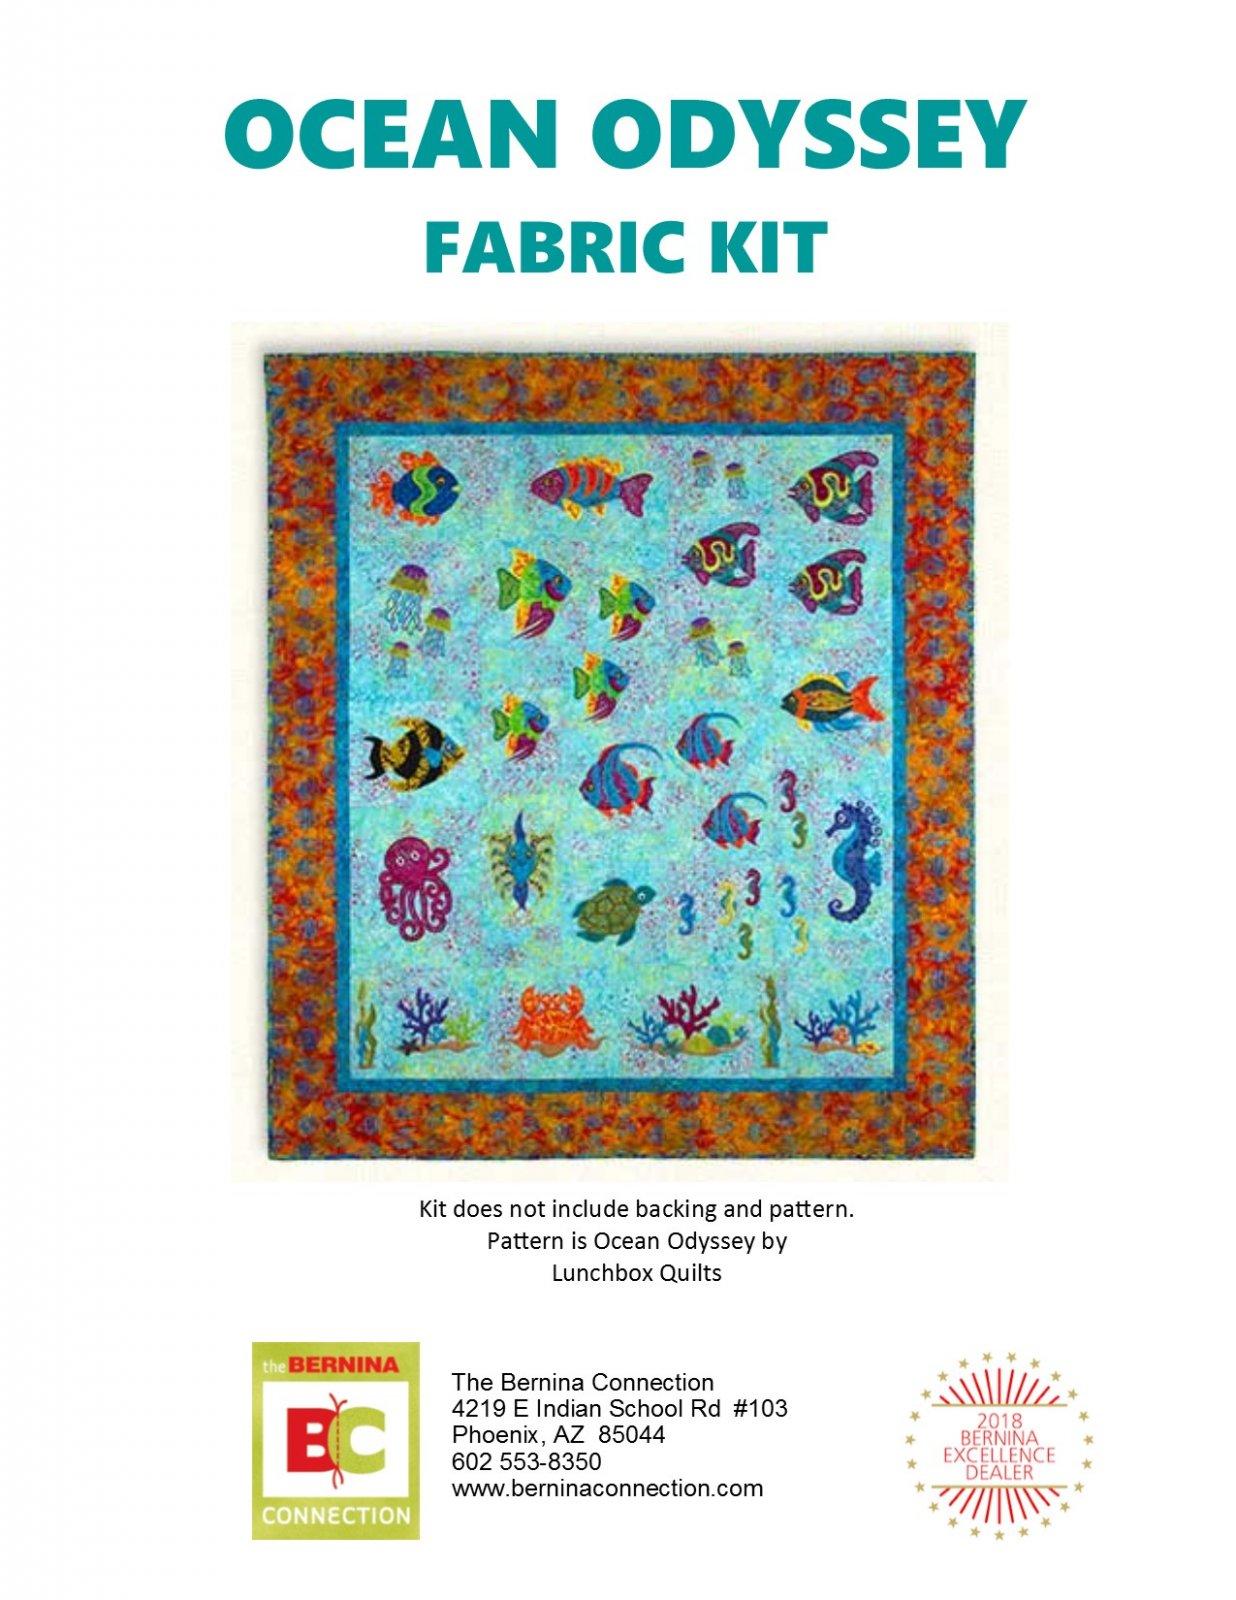 Ocean Odyssey Fabric Kit